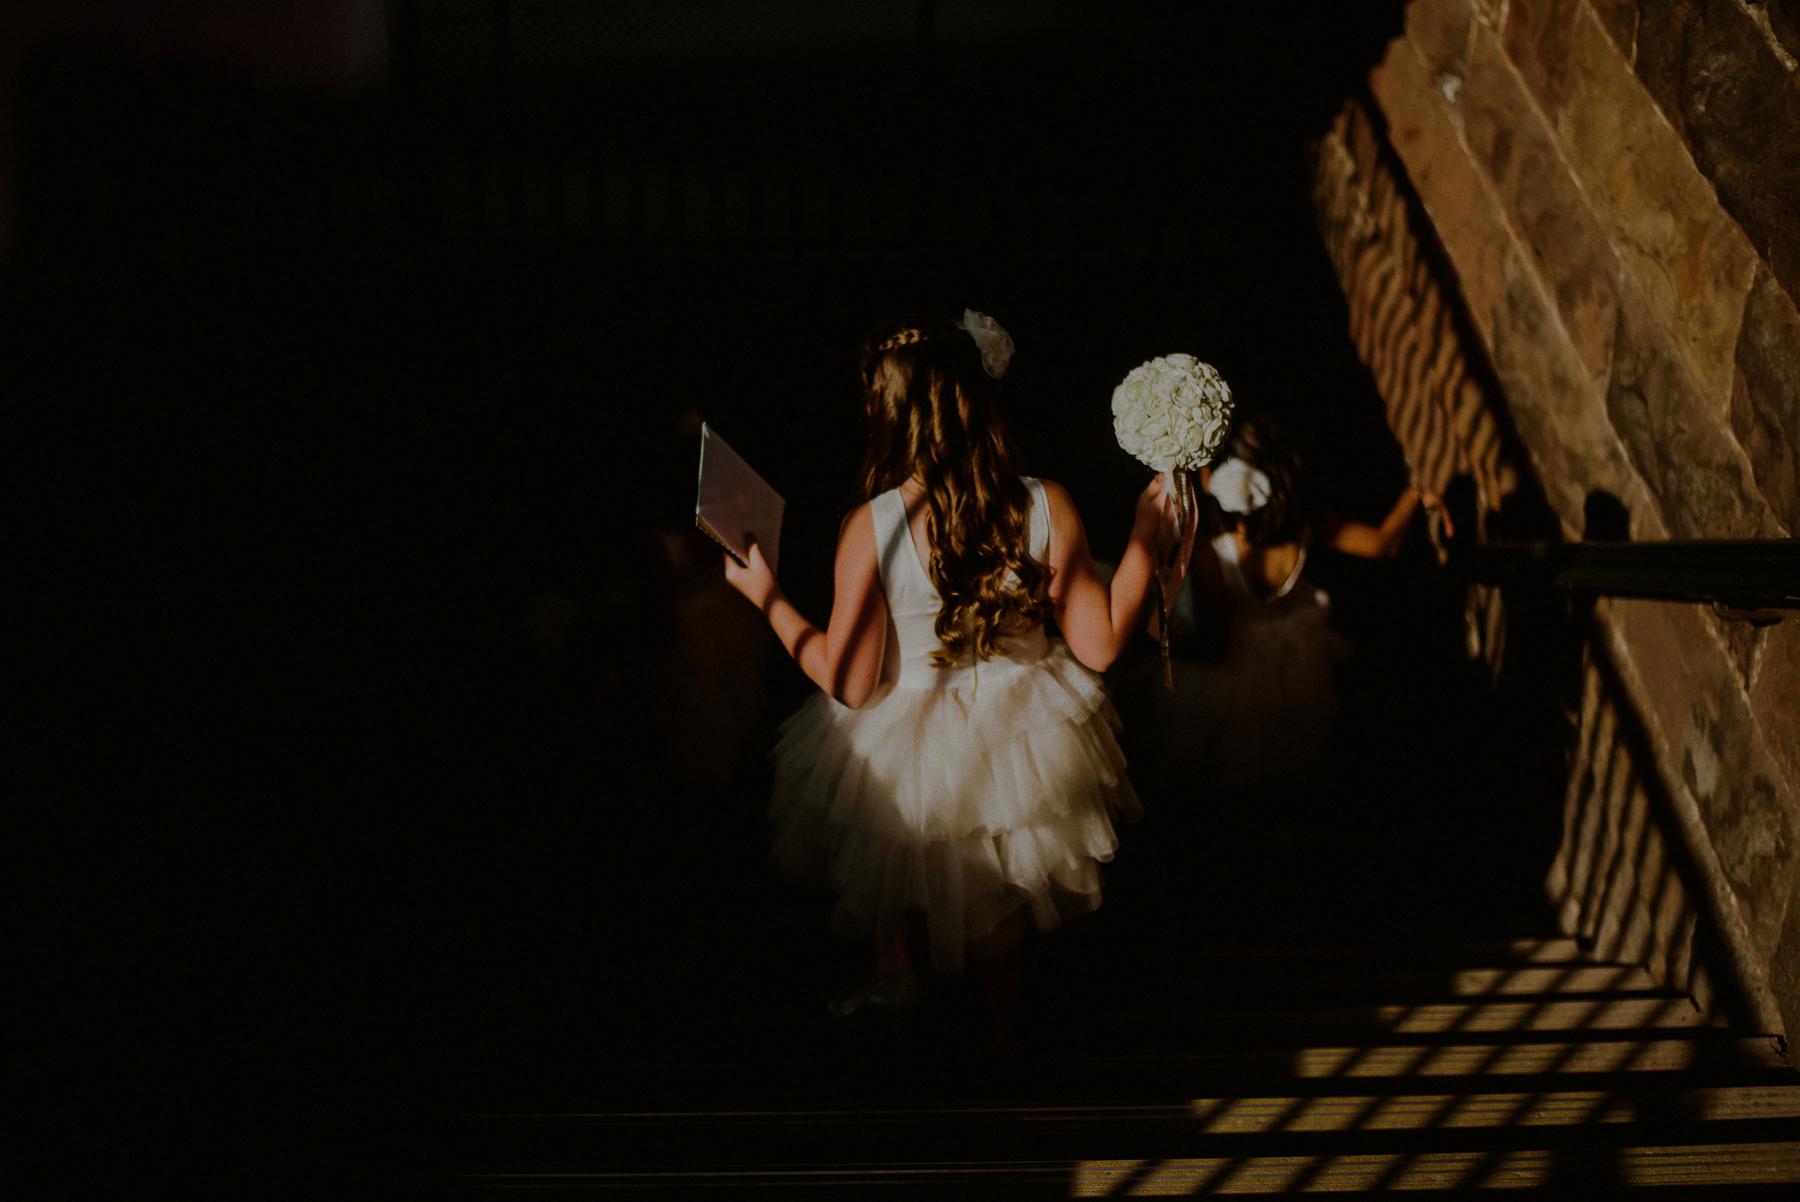 best artistic wedding photographer nj